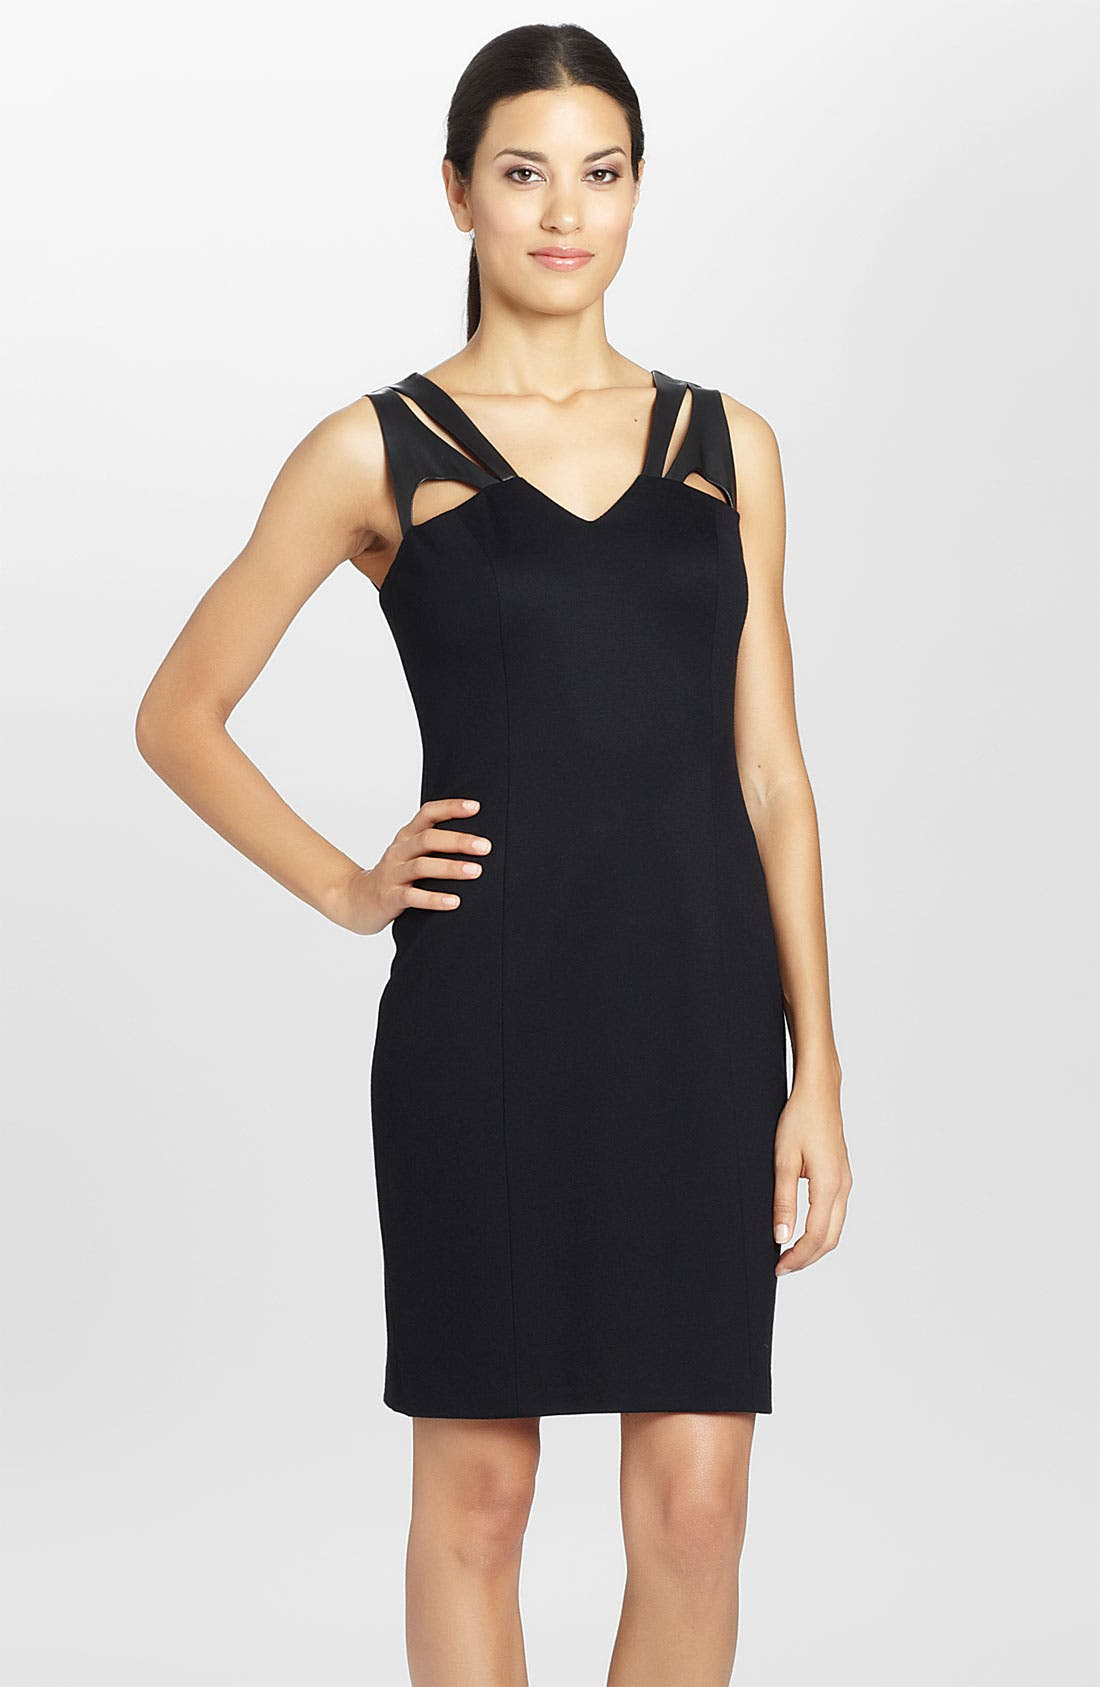 Alternate Image 1 Selected - Cynthia Steffe 'Callie' Cutout Leather & Ponte Sheath Dress